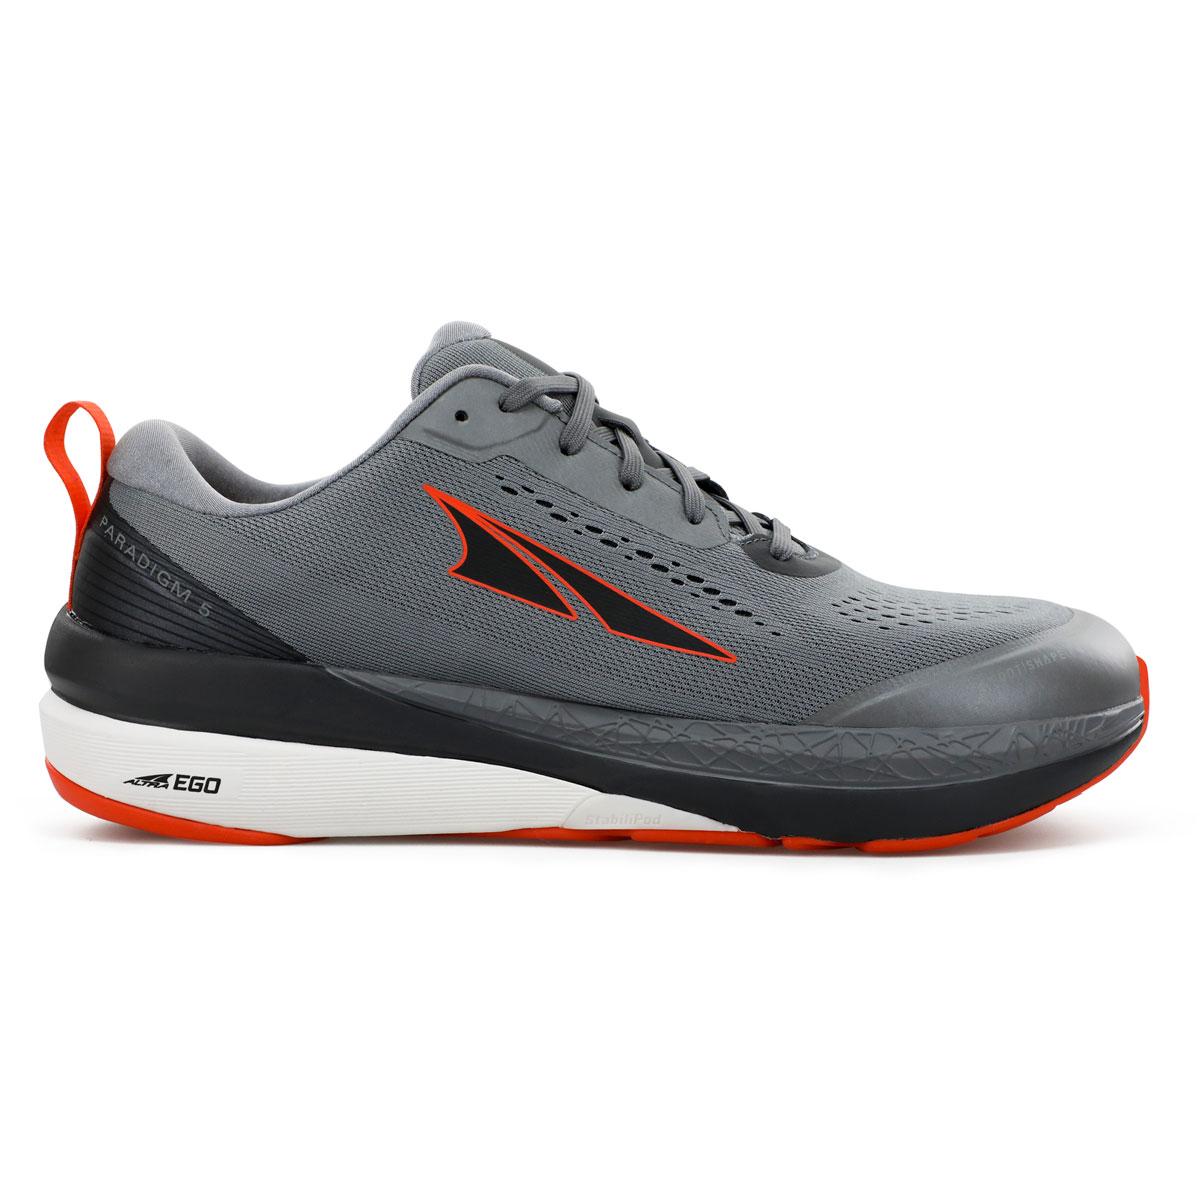 Men's Altra Paradigm 5 Running Shoe - Color: Gray/Orange - Size: 7 - Width: Regular, Gray/Orange, large, image 1